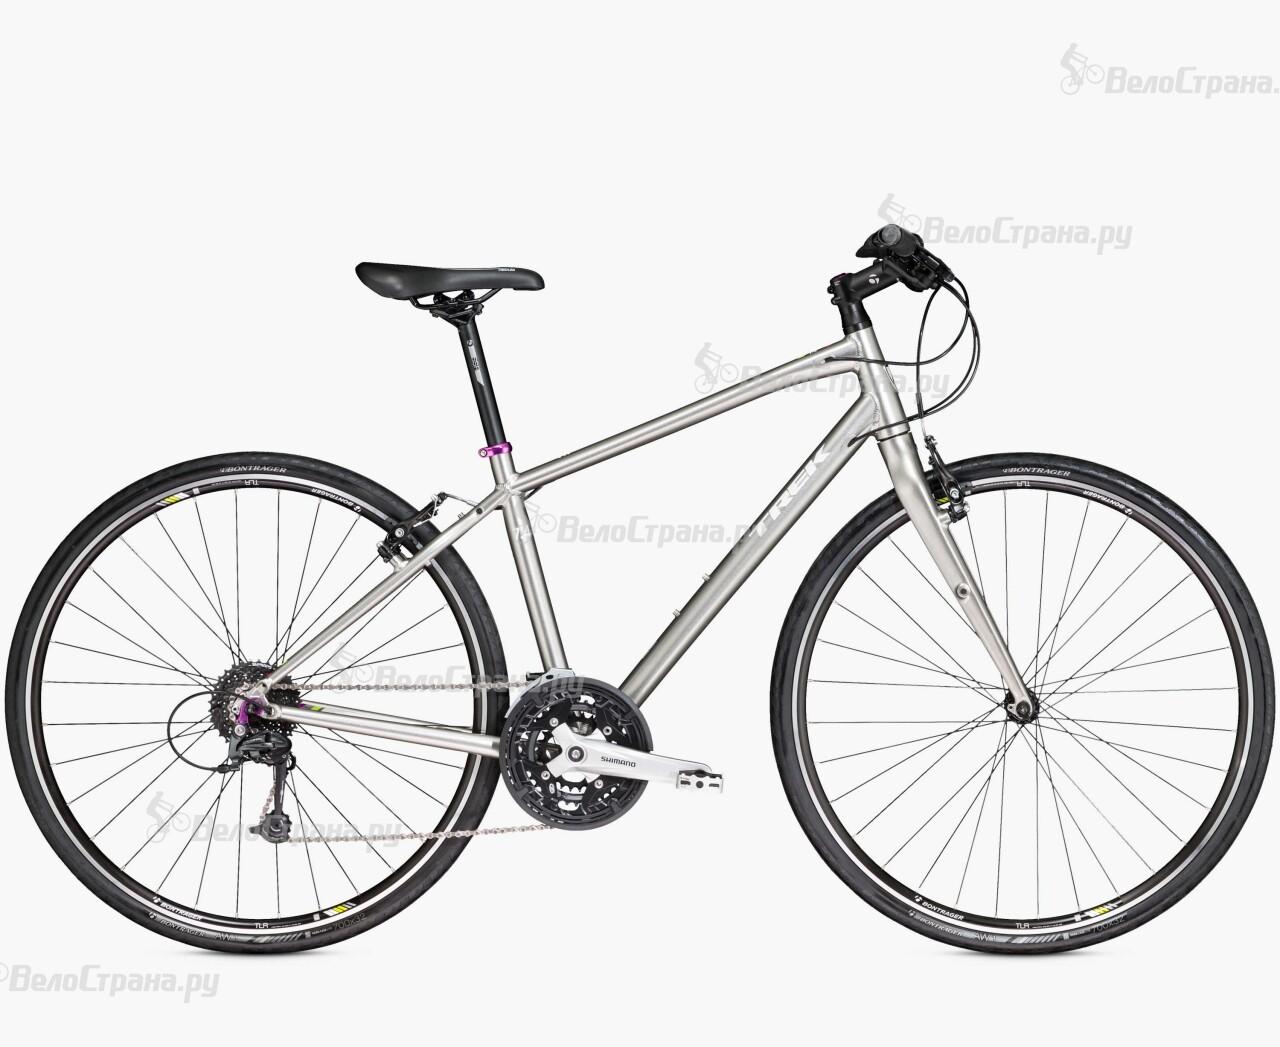 Велосипед Trek 7.4 FX WSD (2016) trek 7 2 fx wsd 2015